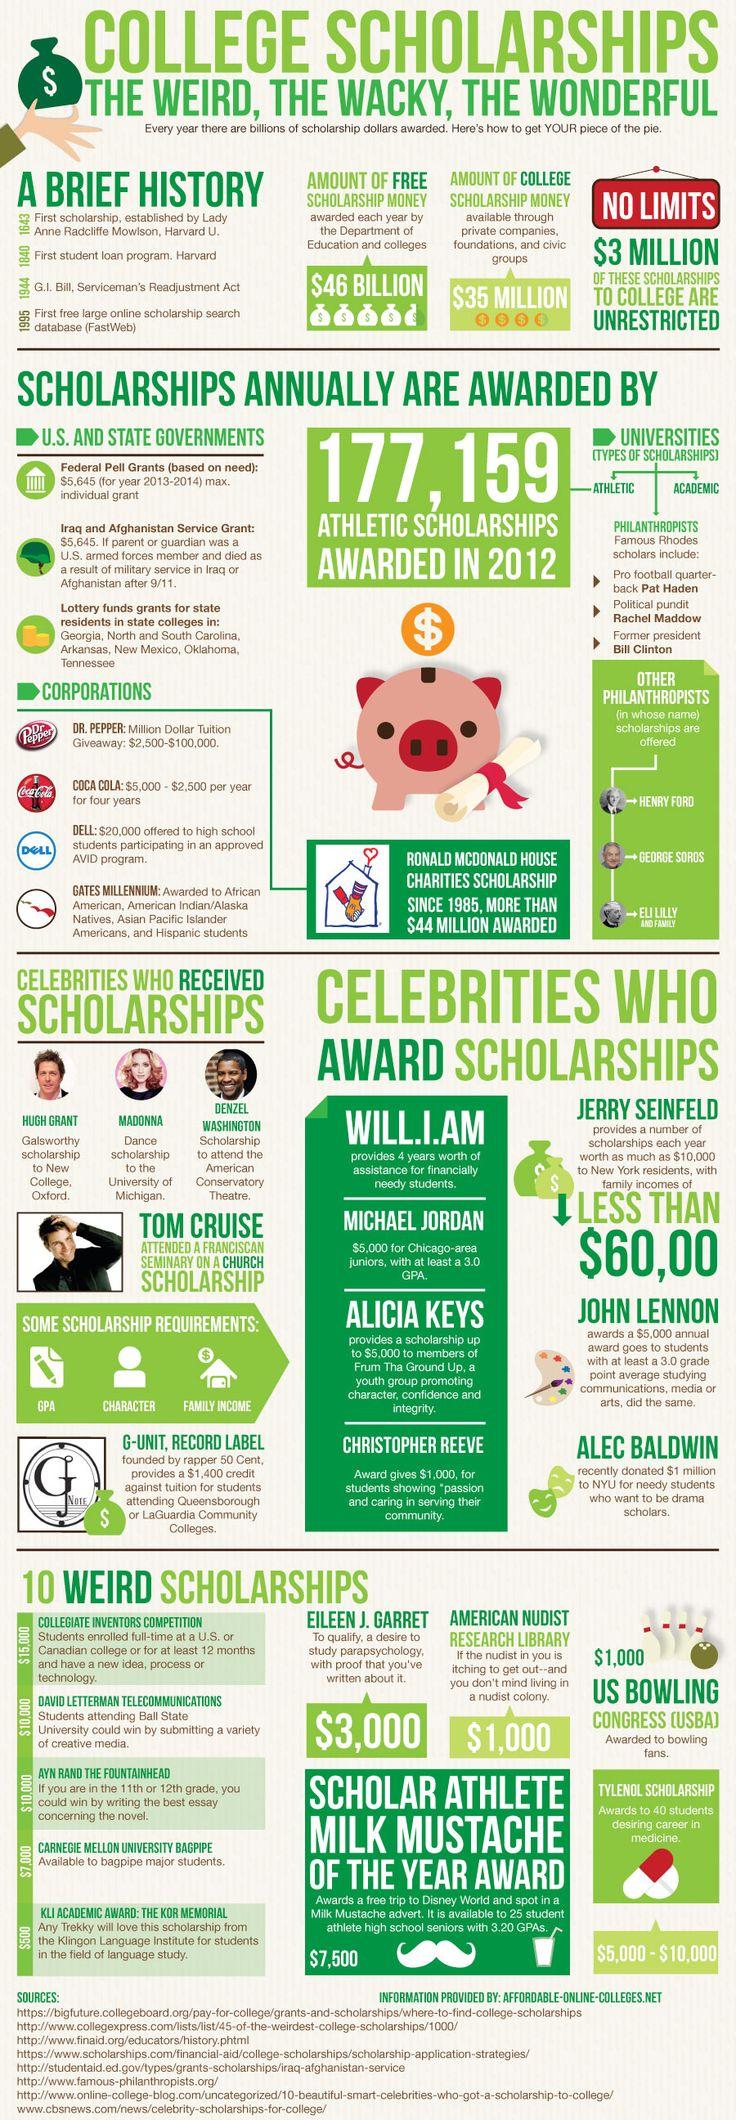 college scholarship essay topics coursework help college scholarship essay topics